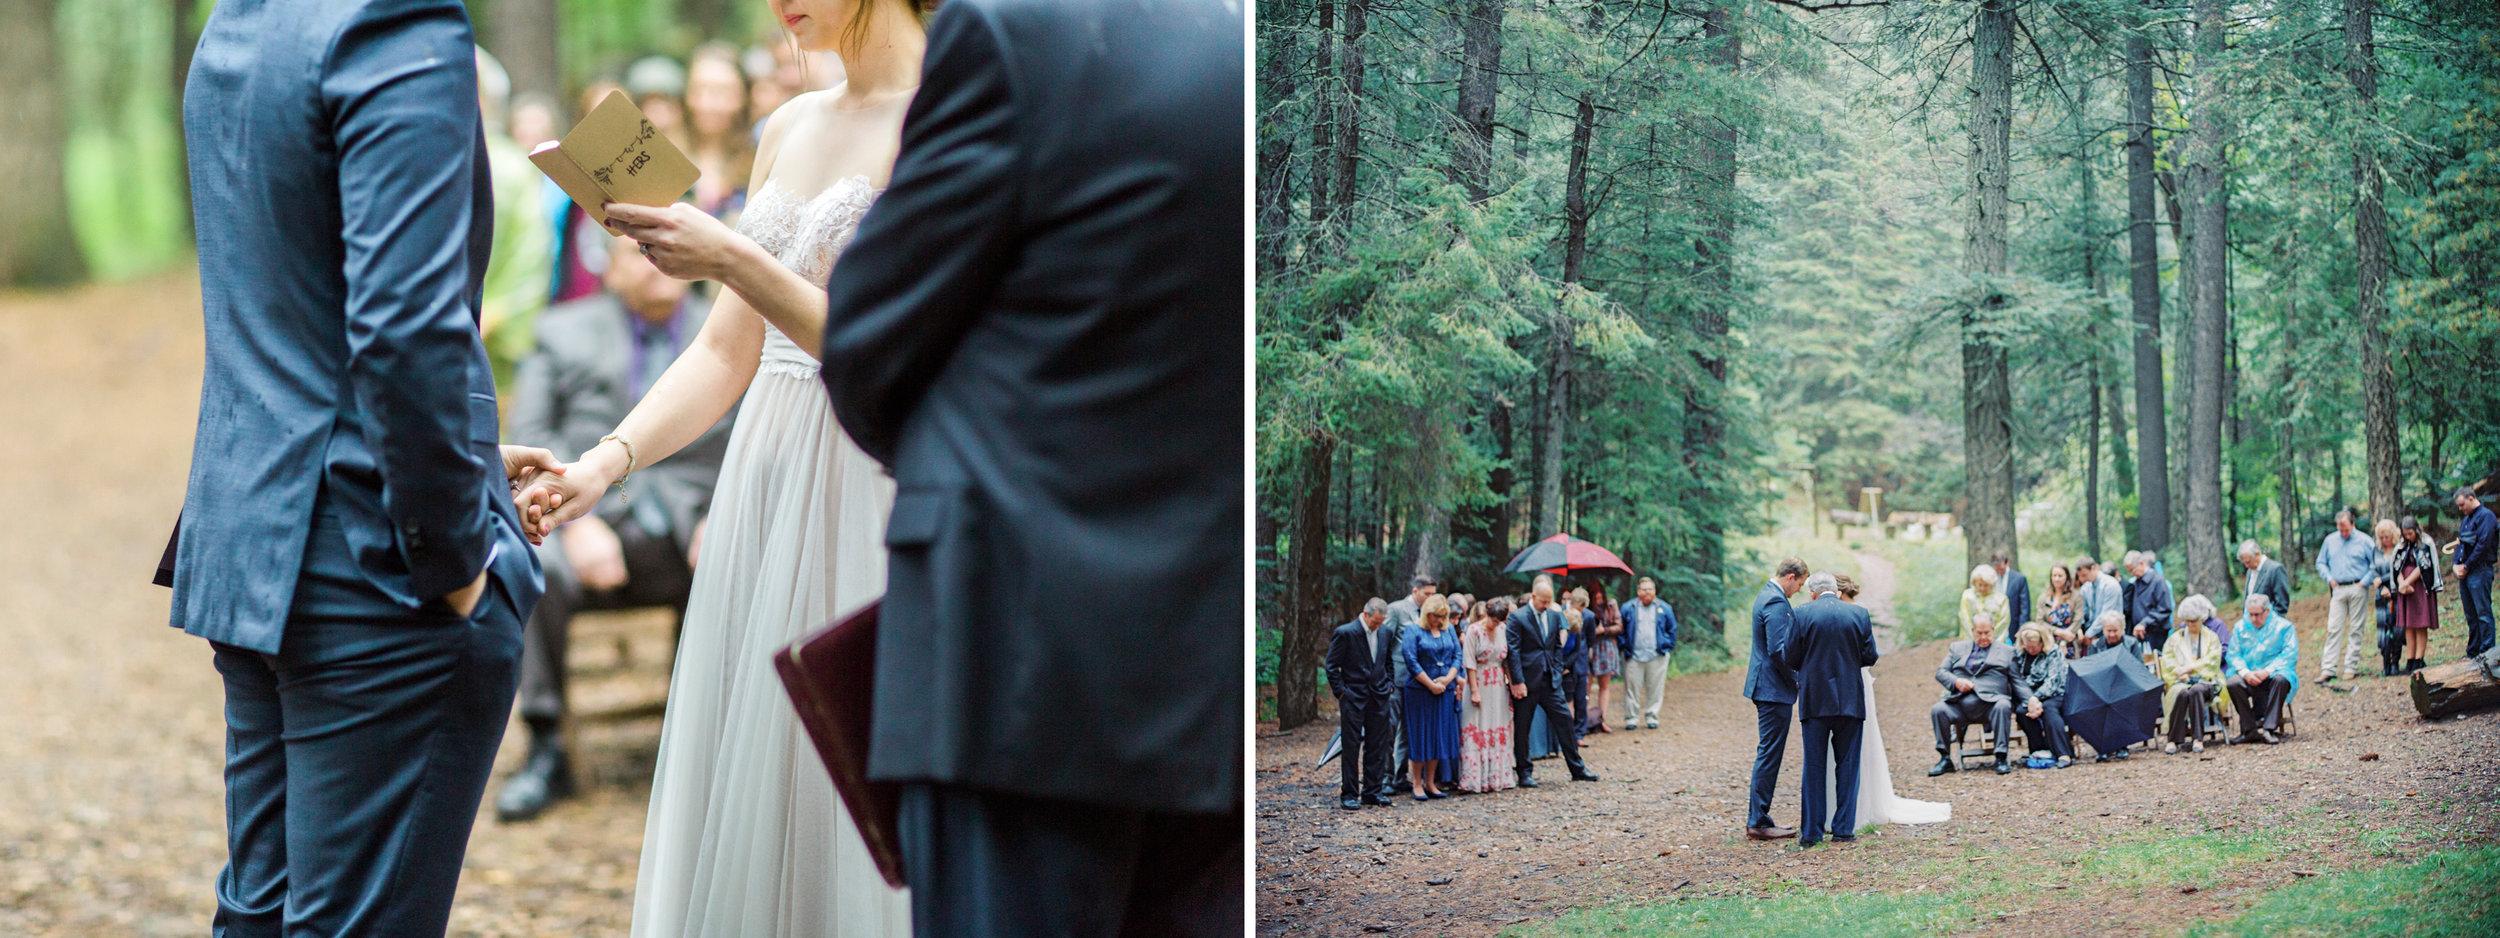 Our Wedding Post_060.JPG